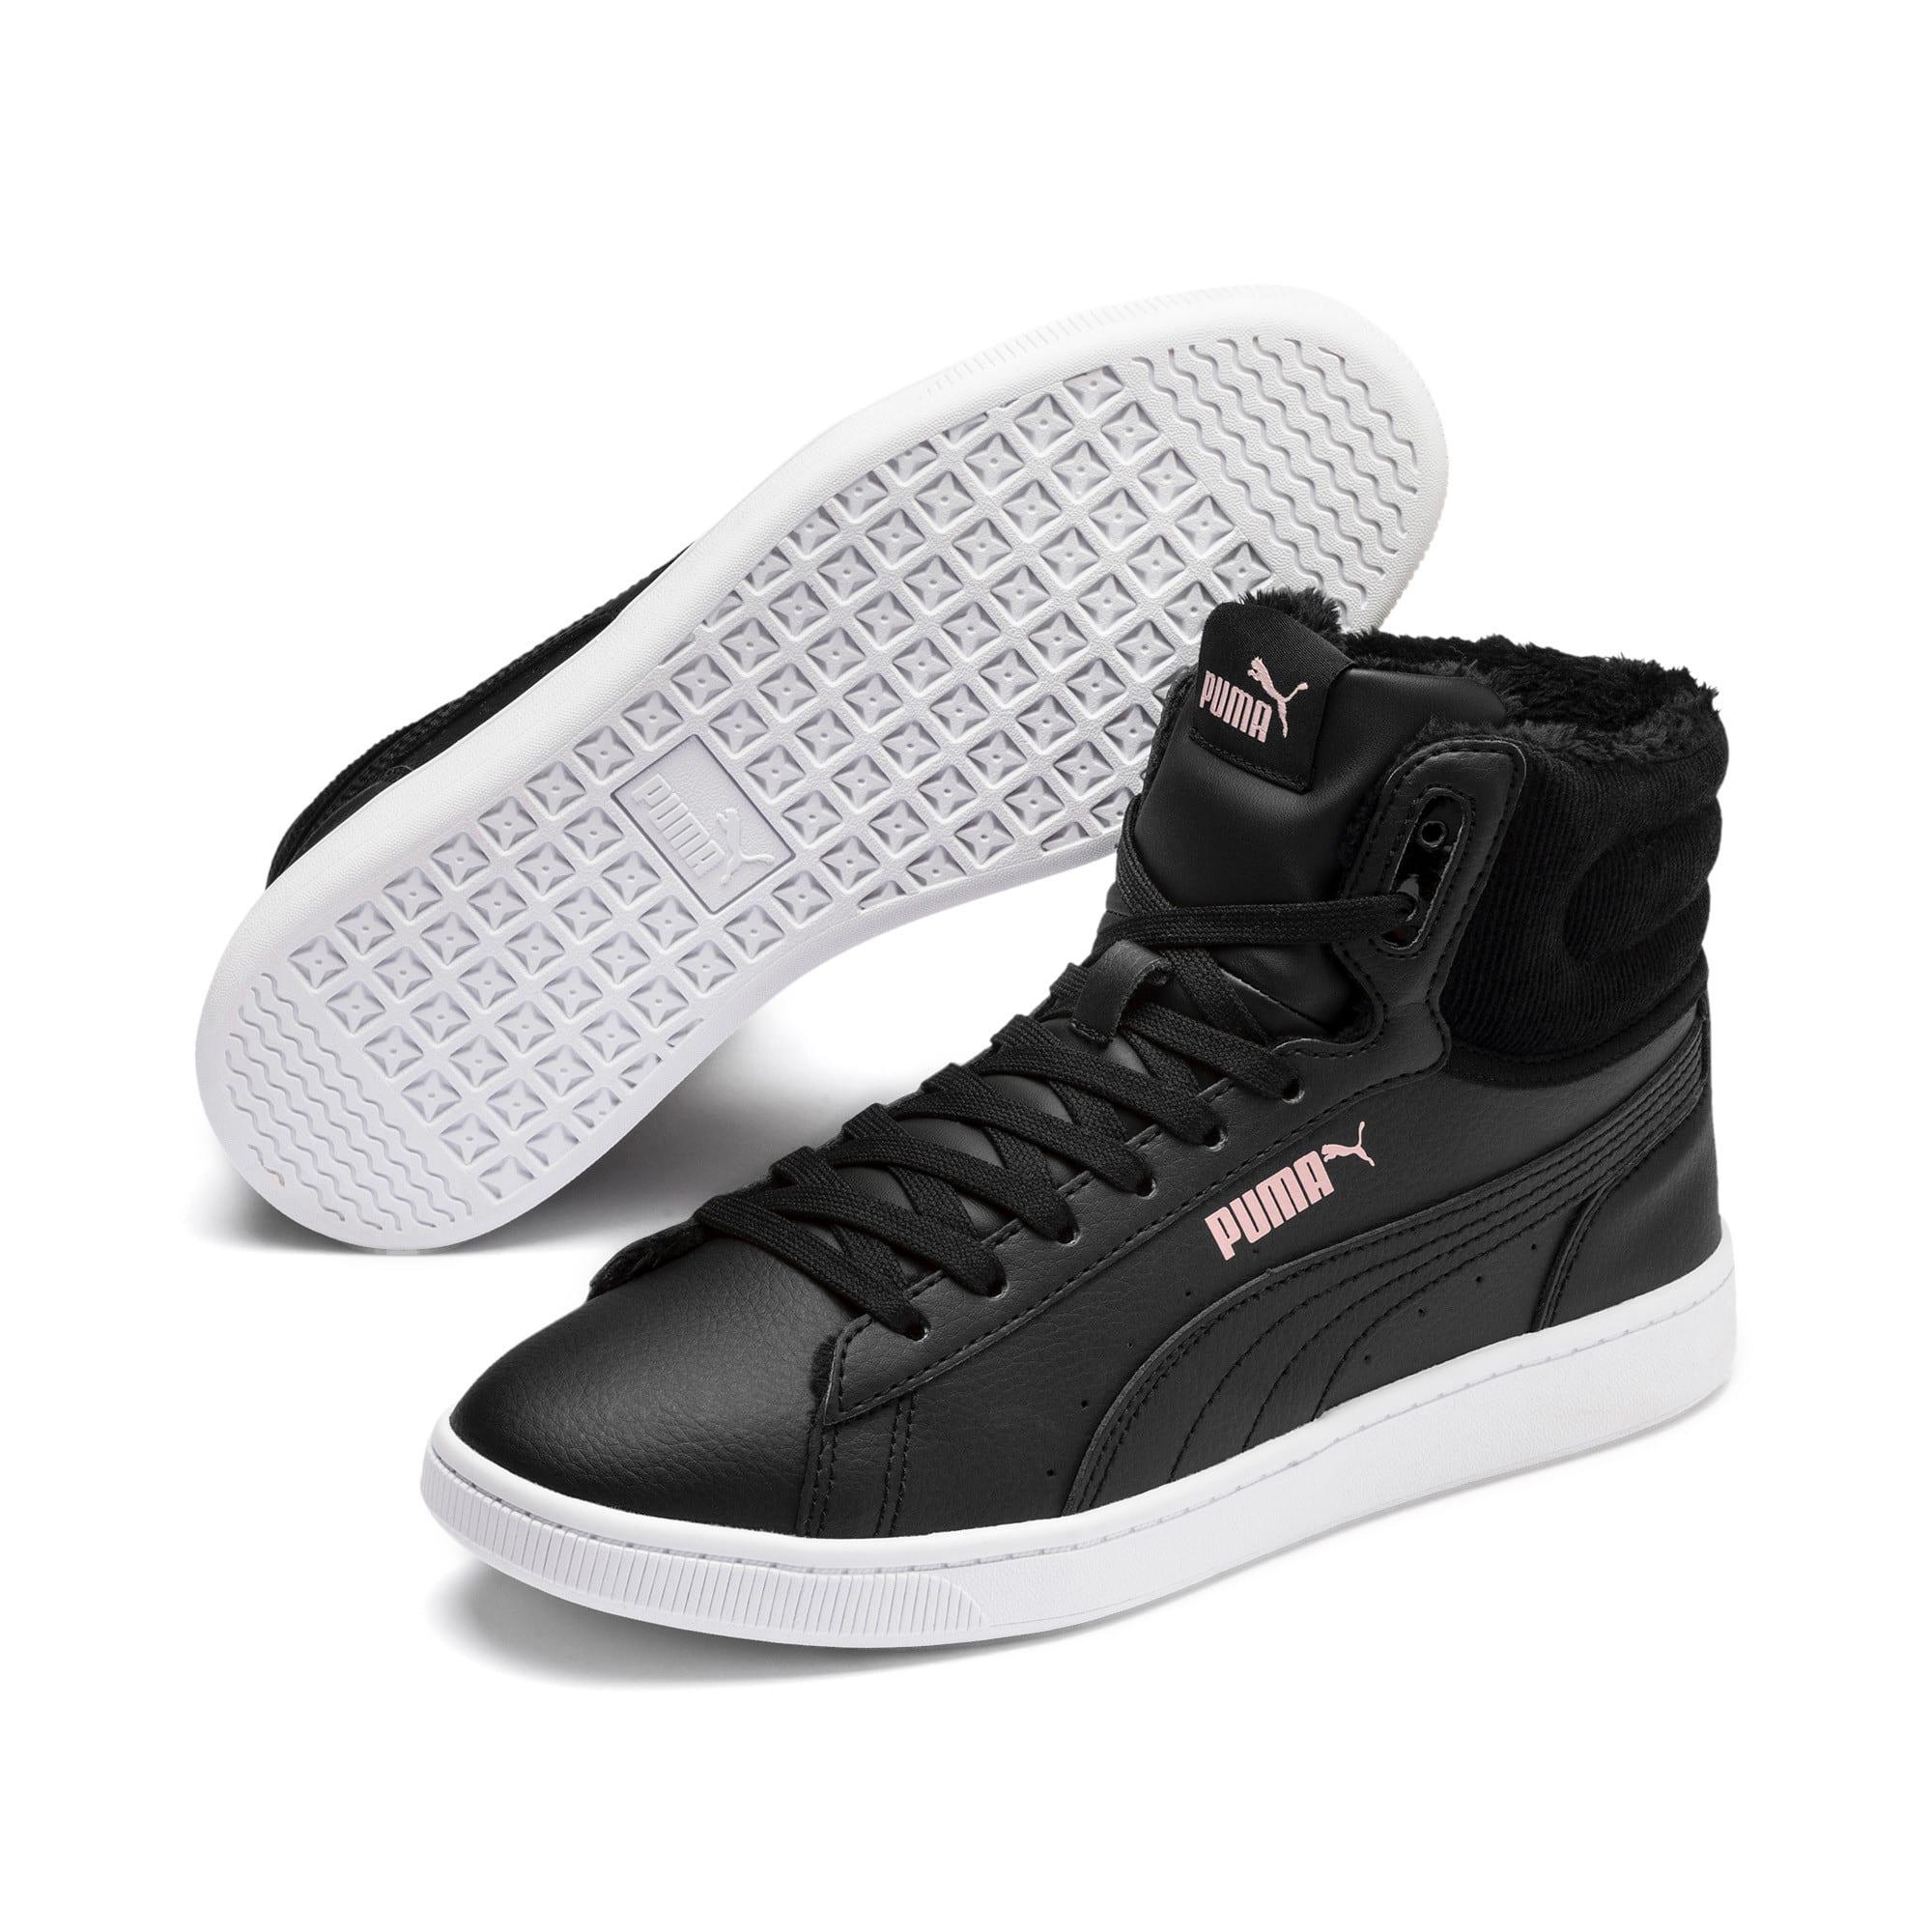 Thumbnail 3 of Vikky v2 mittelhoher Damen Winter Sneaker, Puma Black-Bridal Rose-White, medium